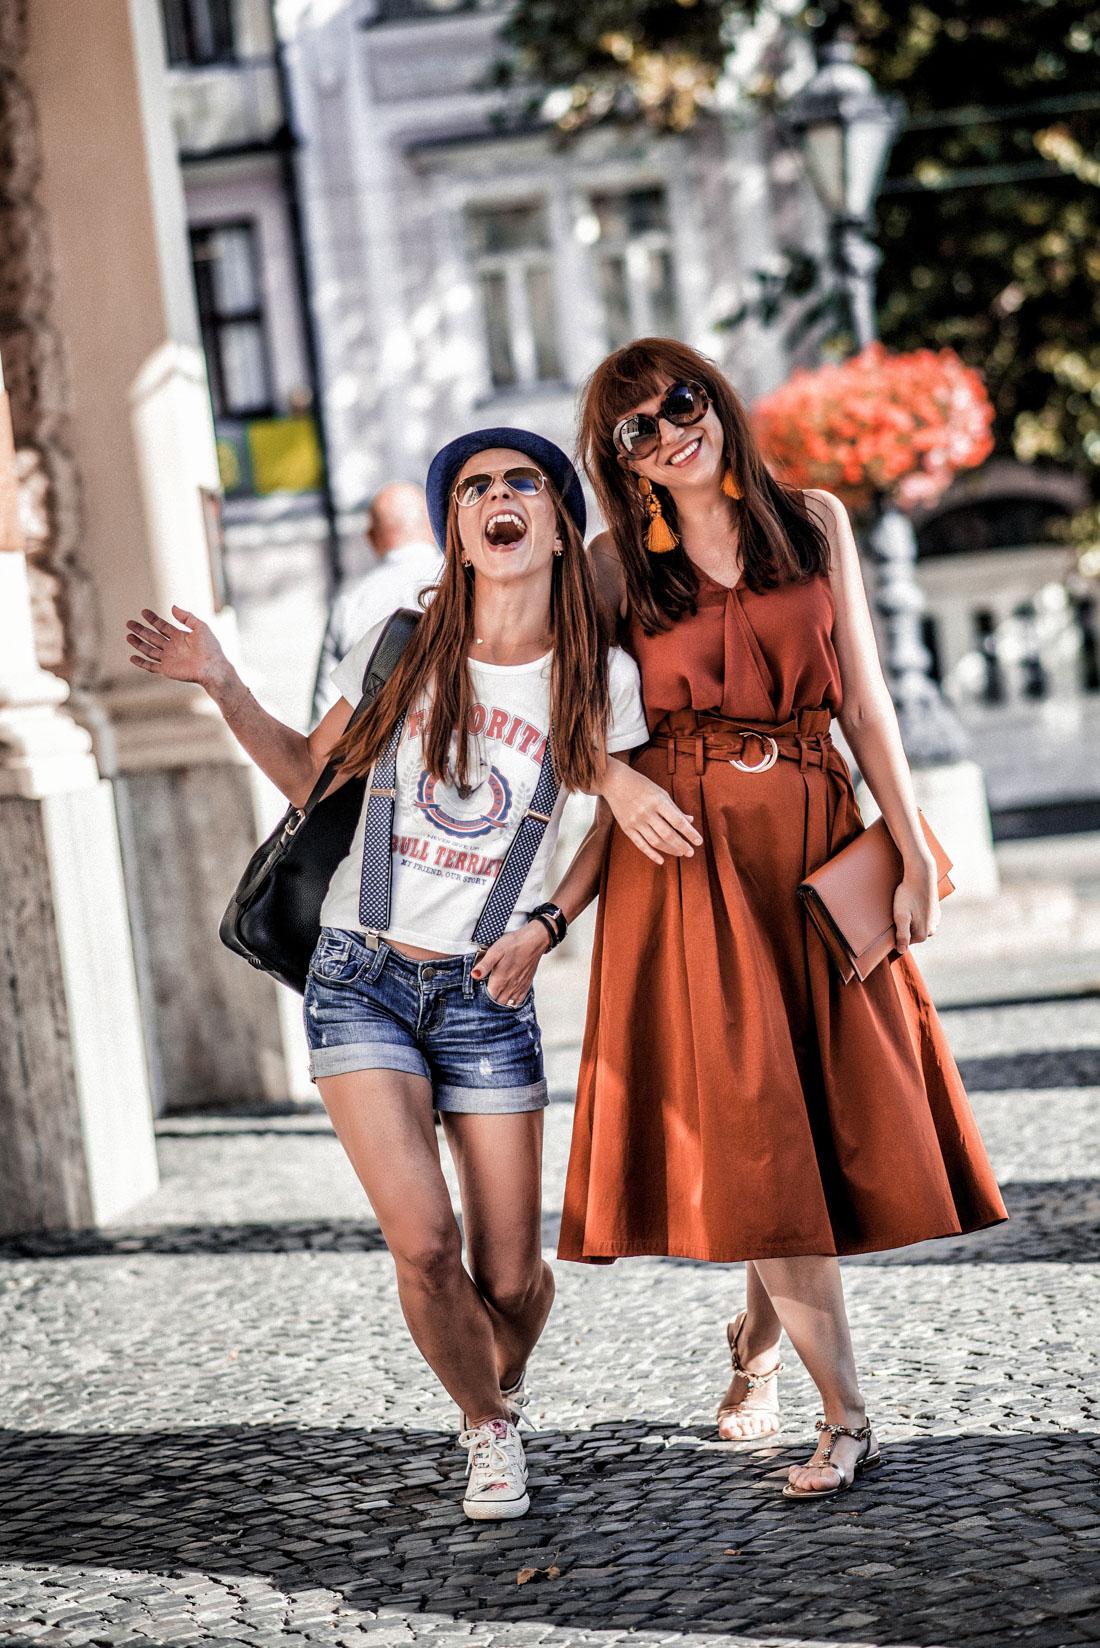 PÁNSKE DOPLNKY OD SLOVENSKEJ ZNAČKY_Katharine-fashion is beautiful_blog 6_pánske doplnky Shperka_Katarína Jakuibčová_Fashion blogerka